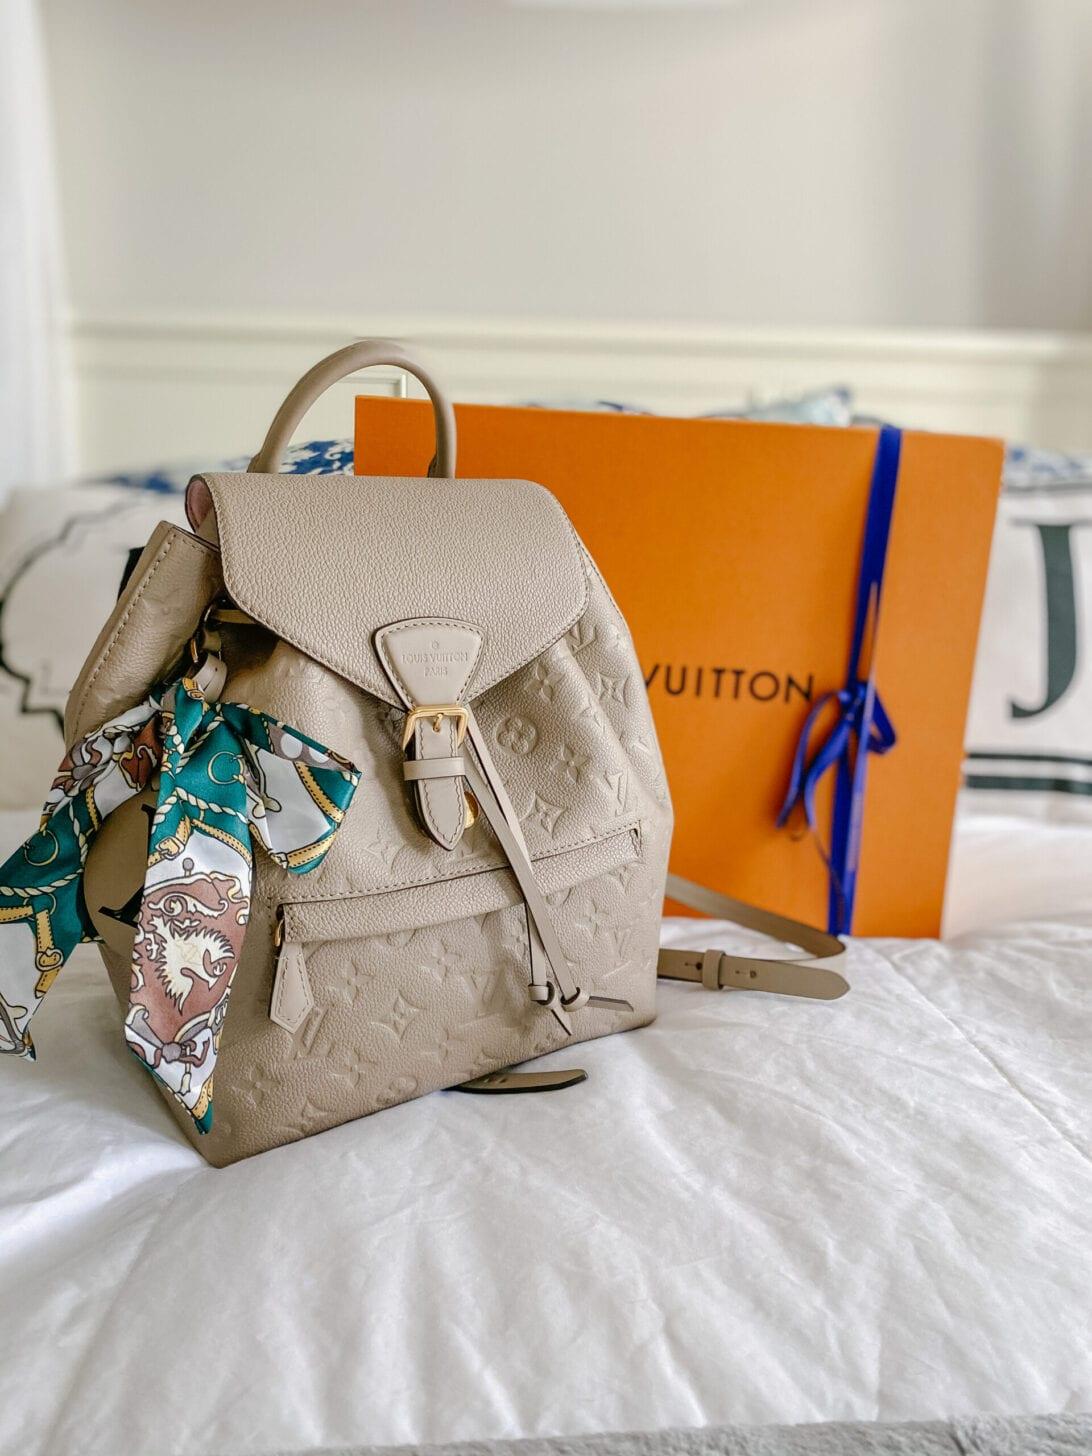 Louis Vuitton Montsouris Backpac, Monogram Empreinte Leather, LV bag, Louis Vuitton bag